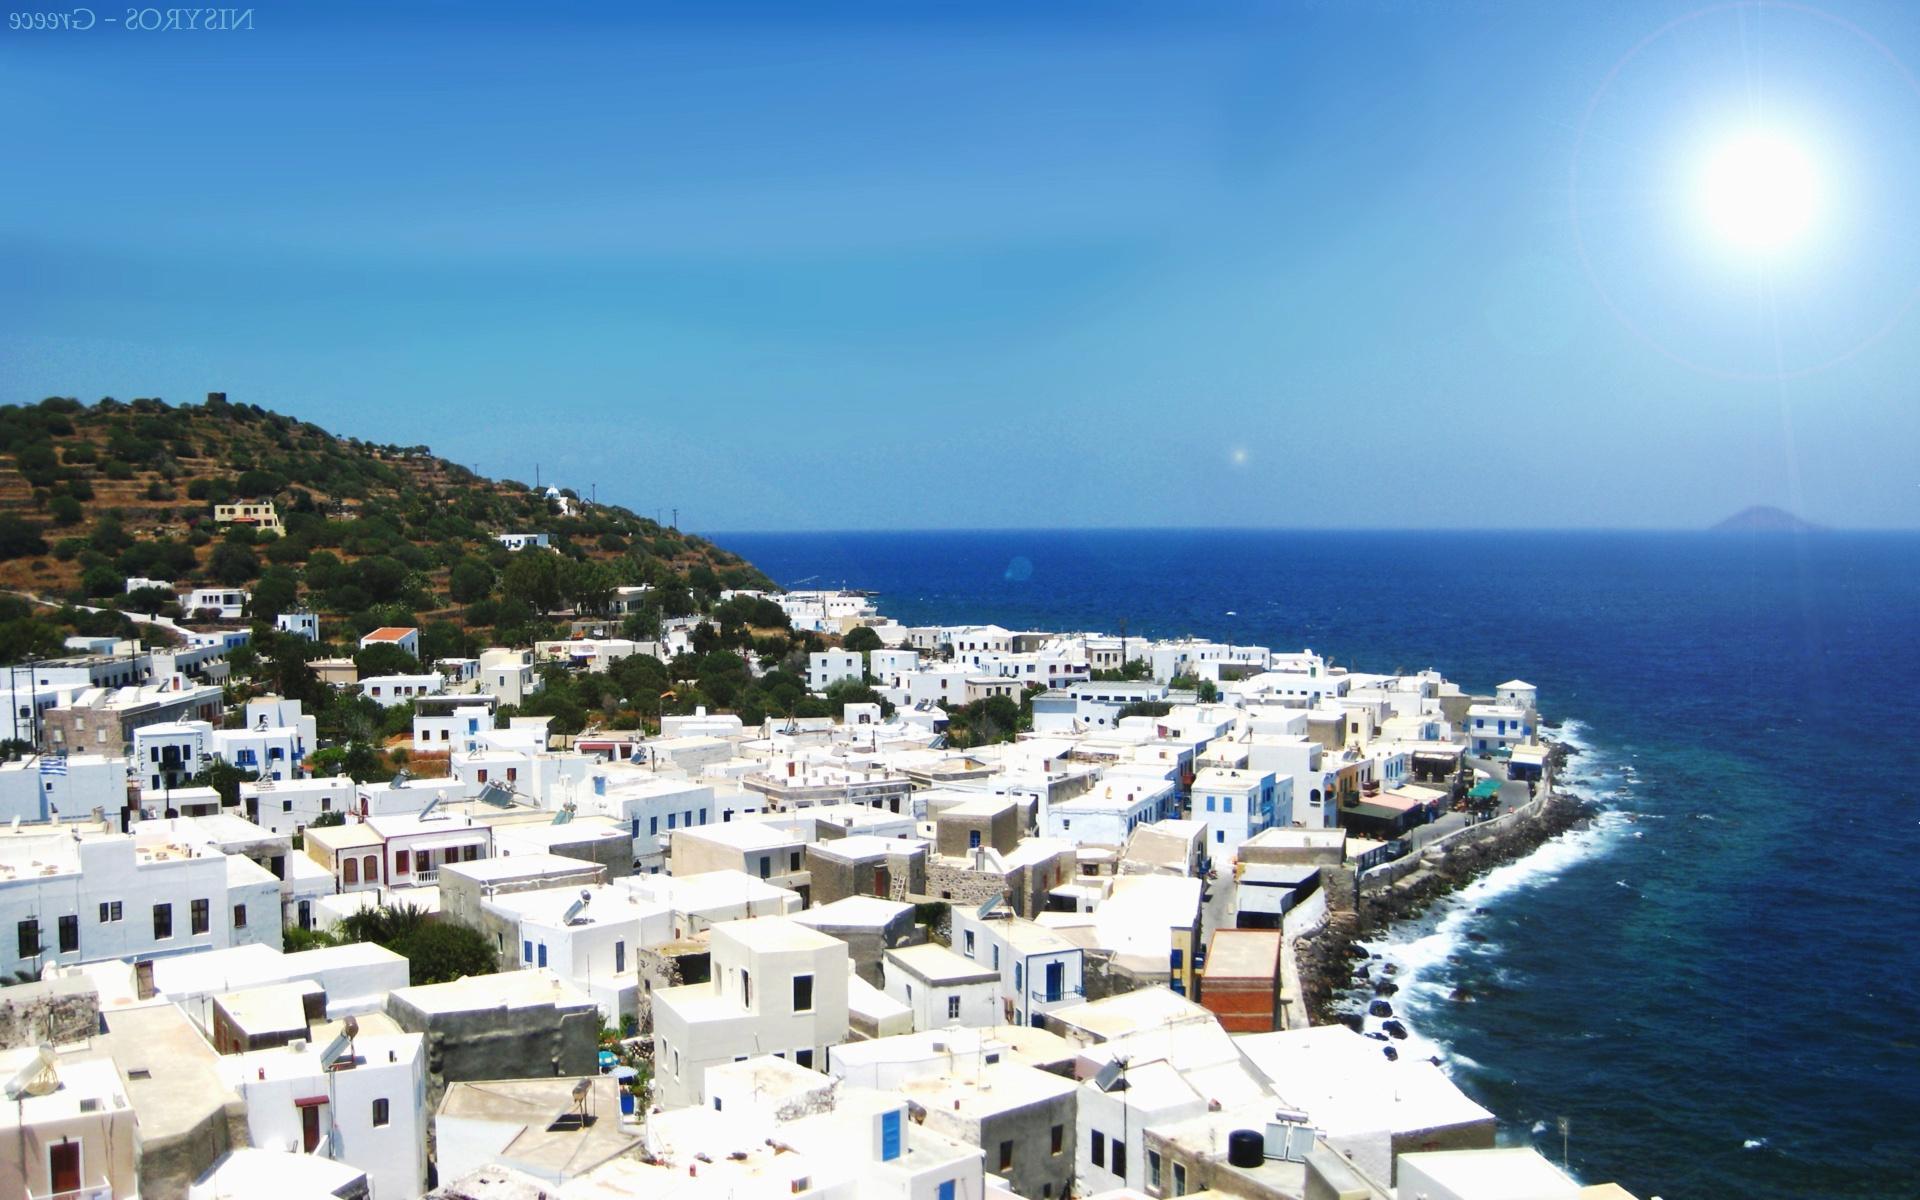 nisyros-greece_island_nature_europe_beach_hd-wallpaper-20883.jpg